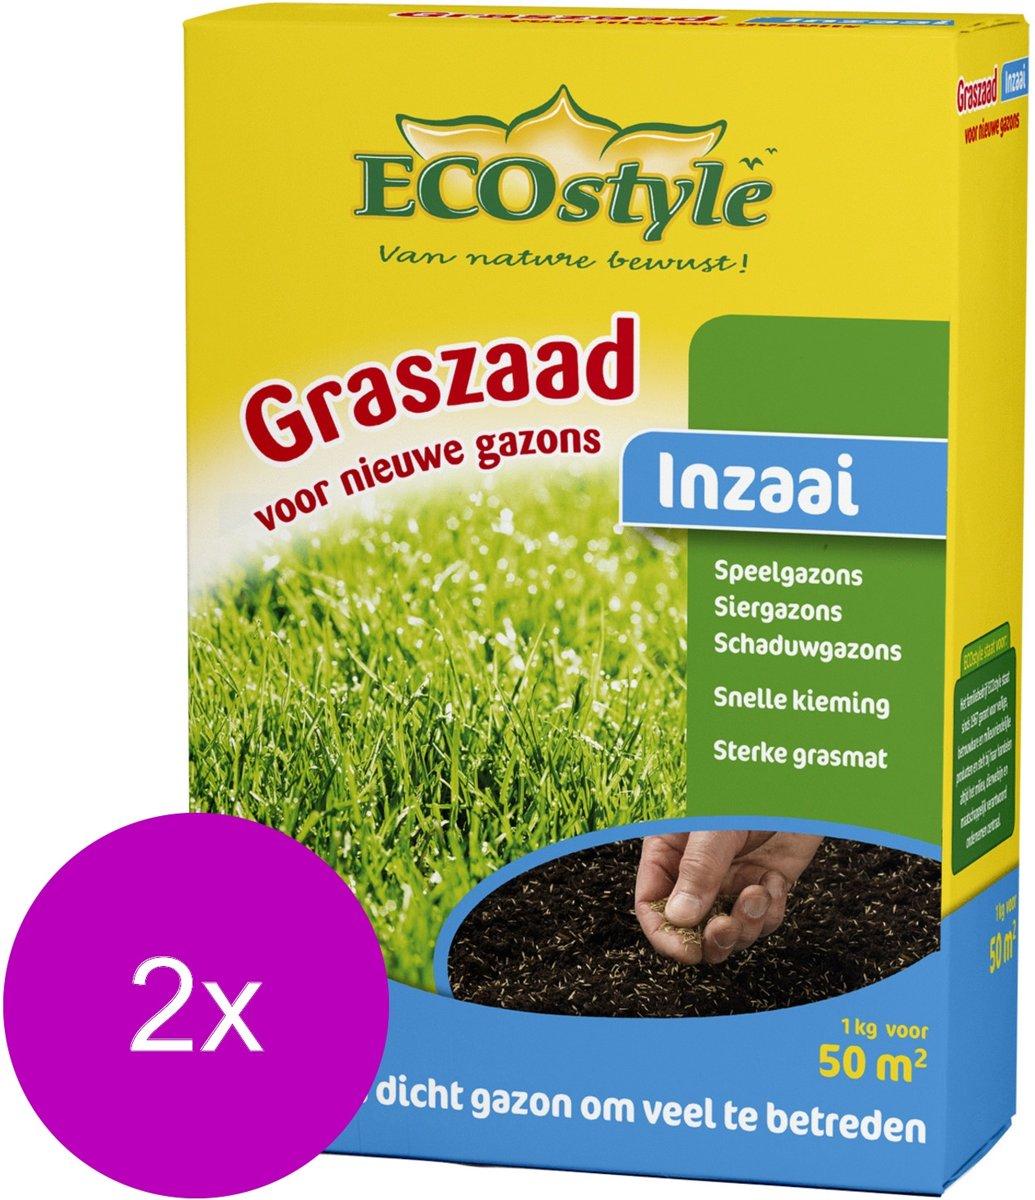 Ecostyle Graszaad-Inzaai 50 m2 - Graszaden - 2 x 1 kg kopen